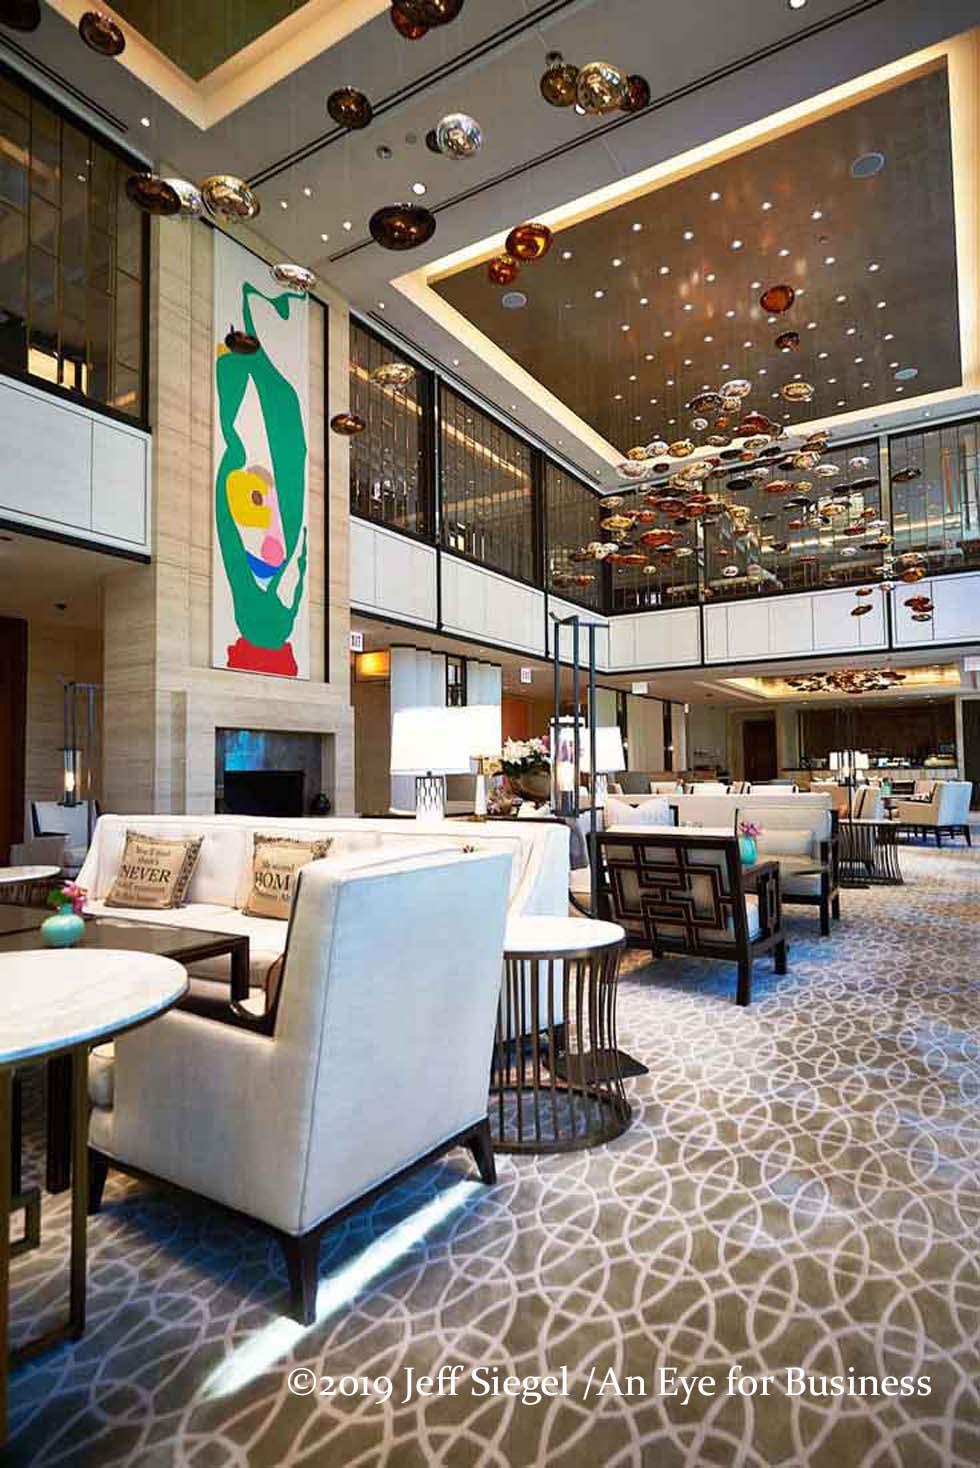 Langham-Hotel-Tea-Room-2-web-Lo-Res.jpg